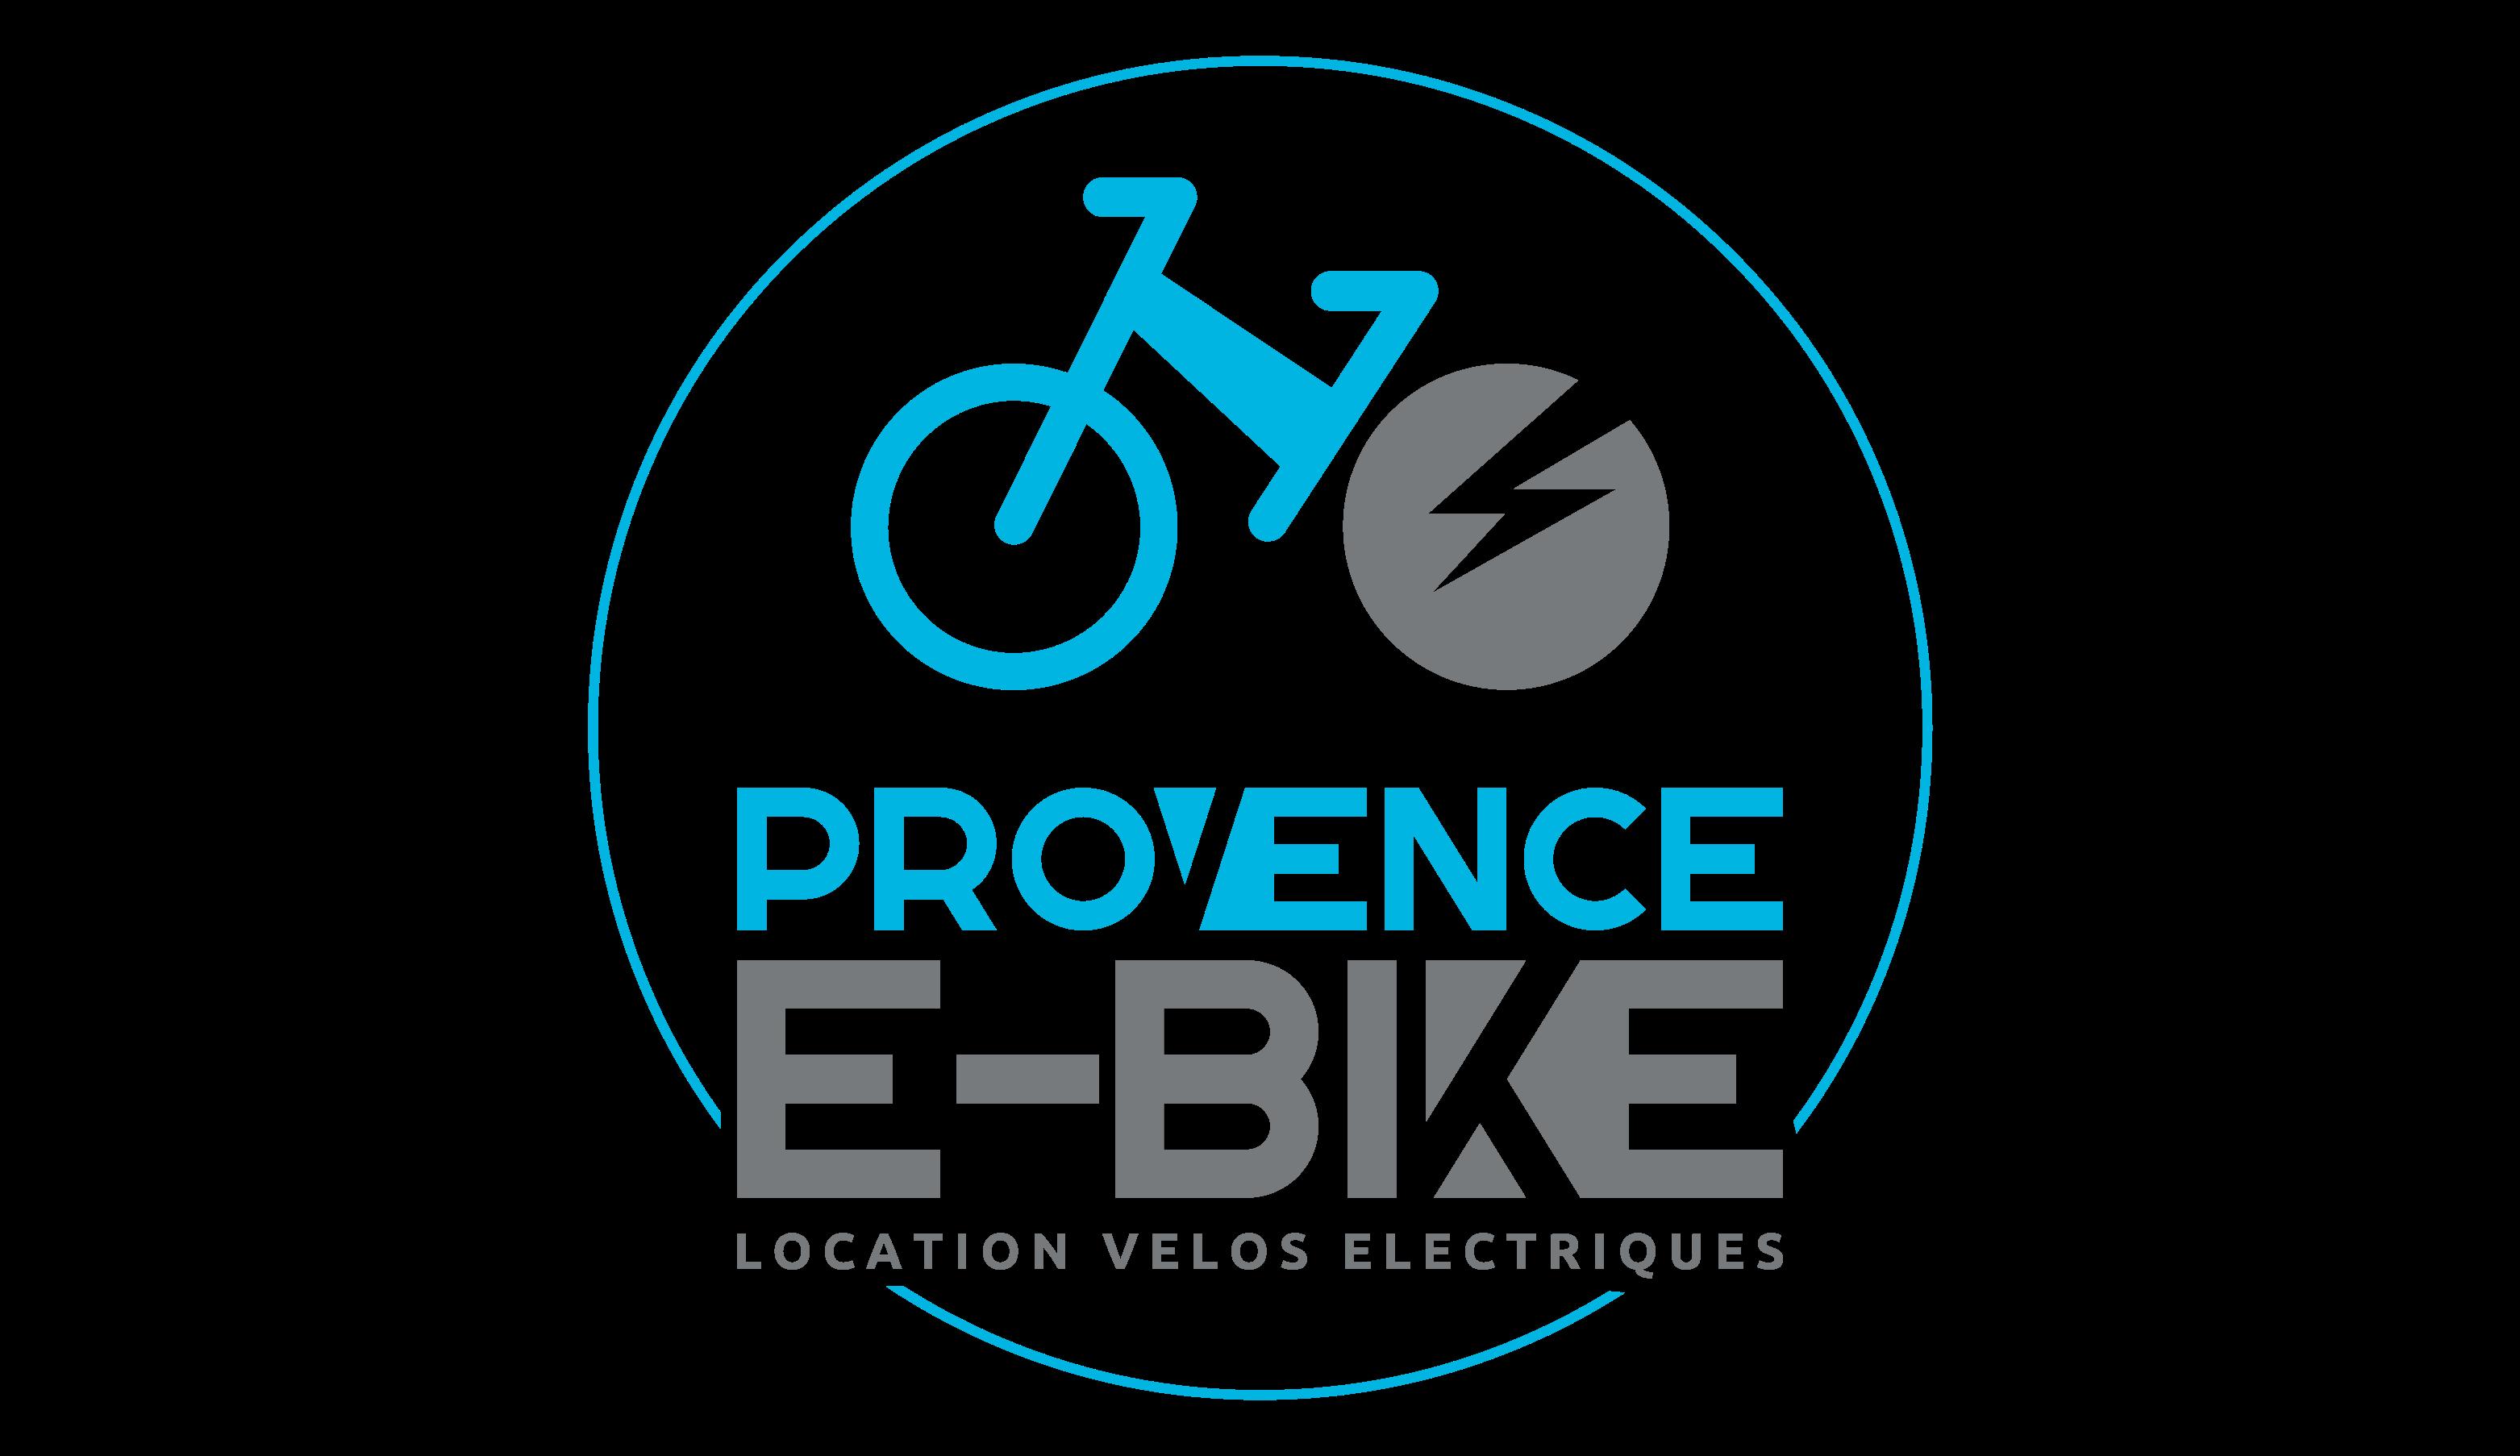 Provence e-bike